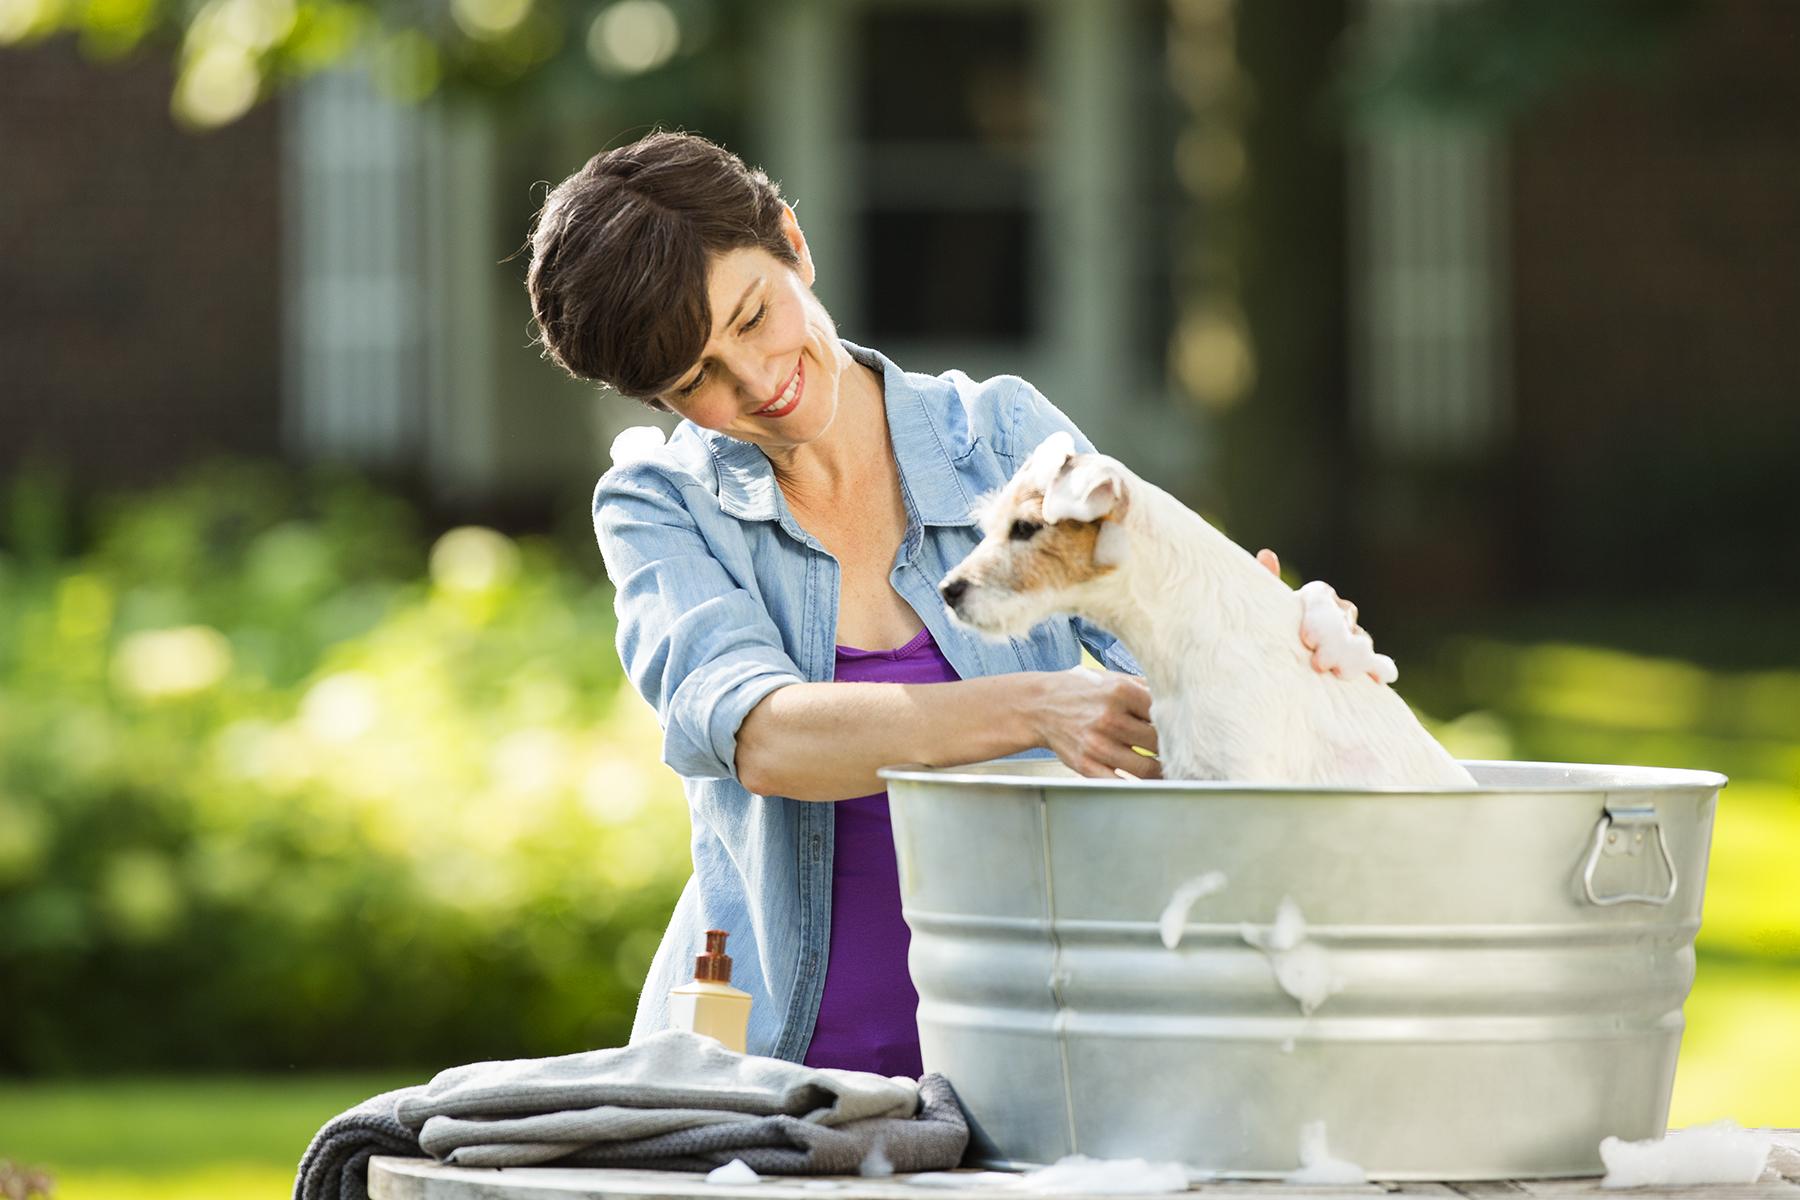 Man-Washing-Dog-143_r1.jpg